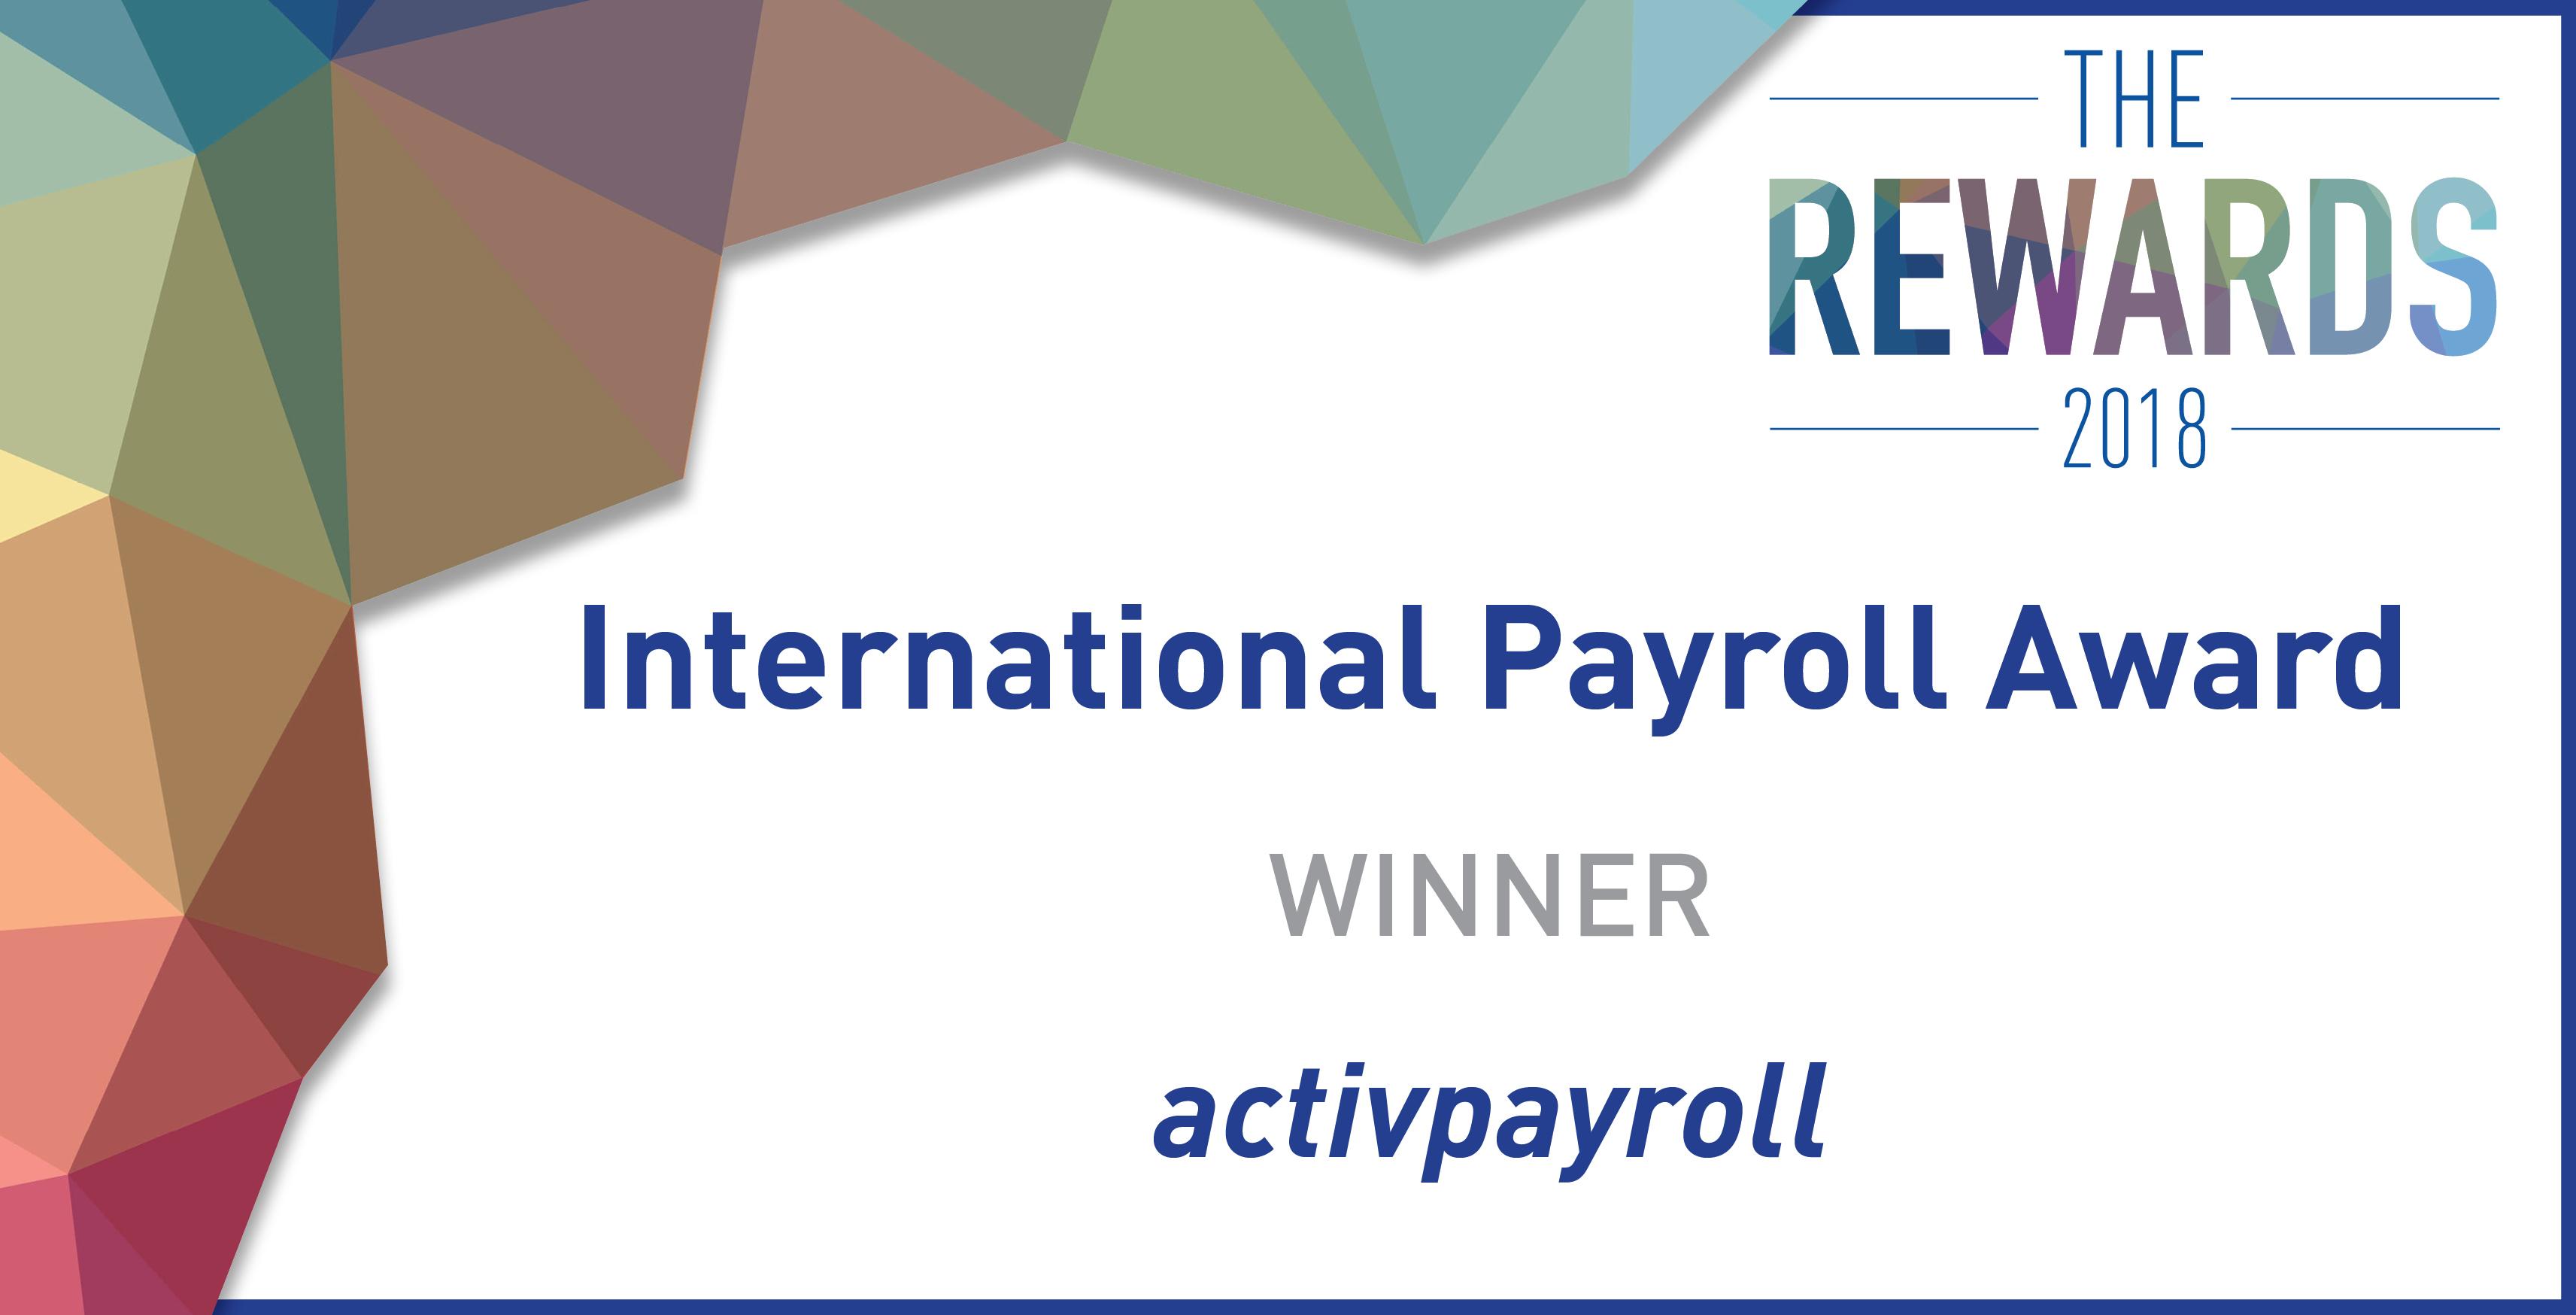 activpayroll wins International Payroll Award